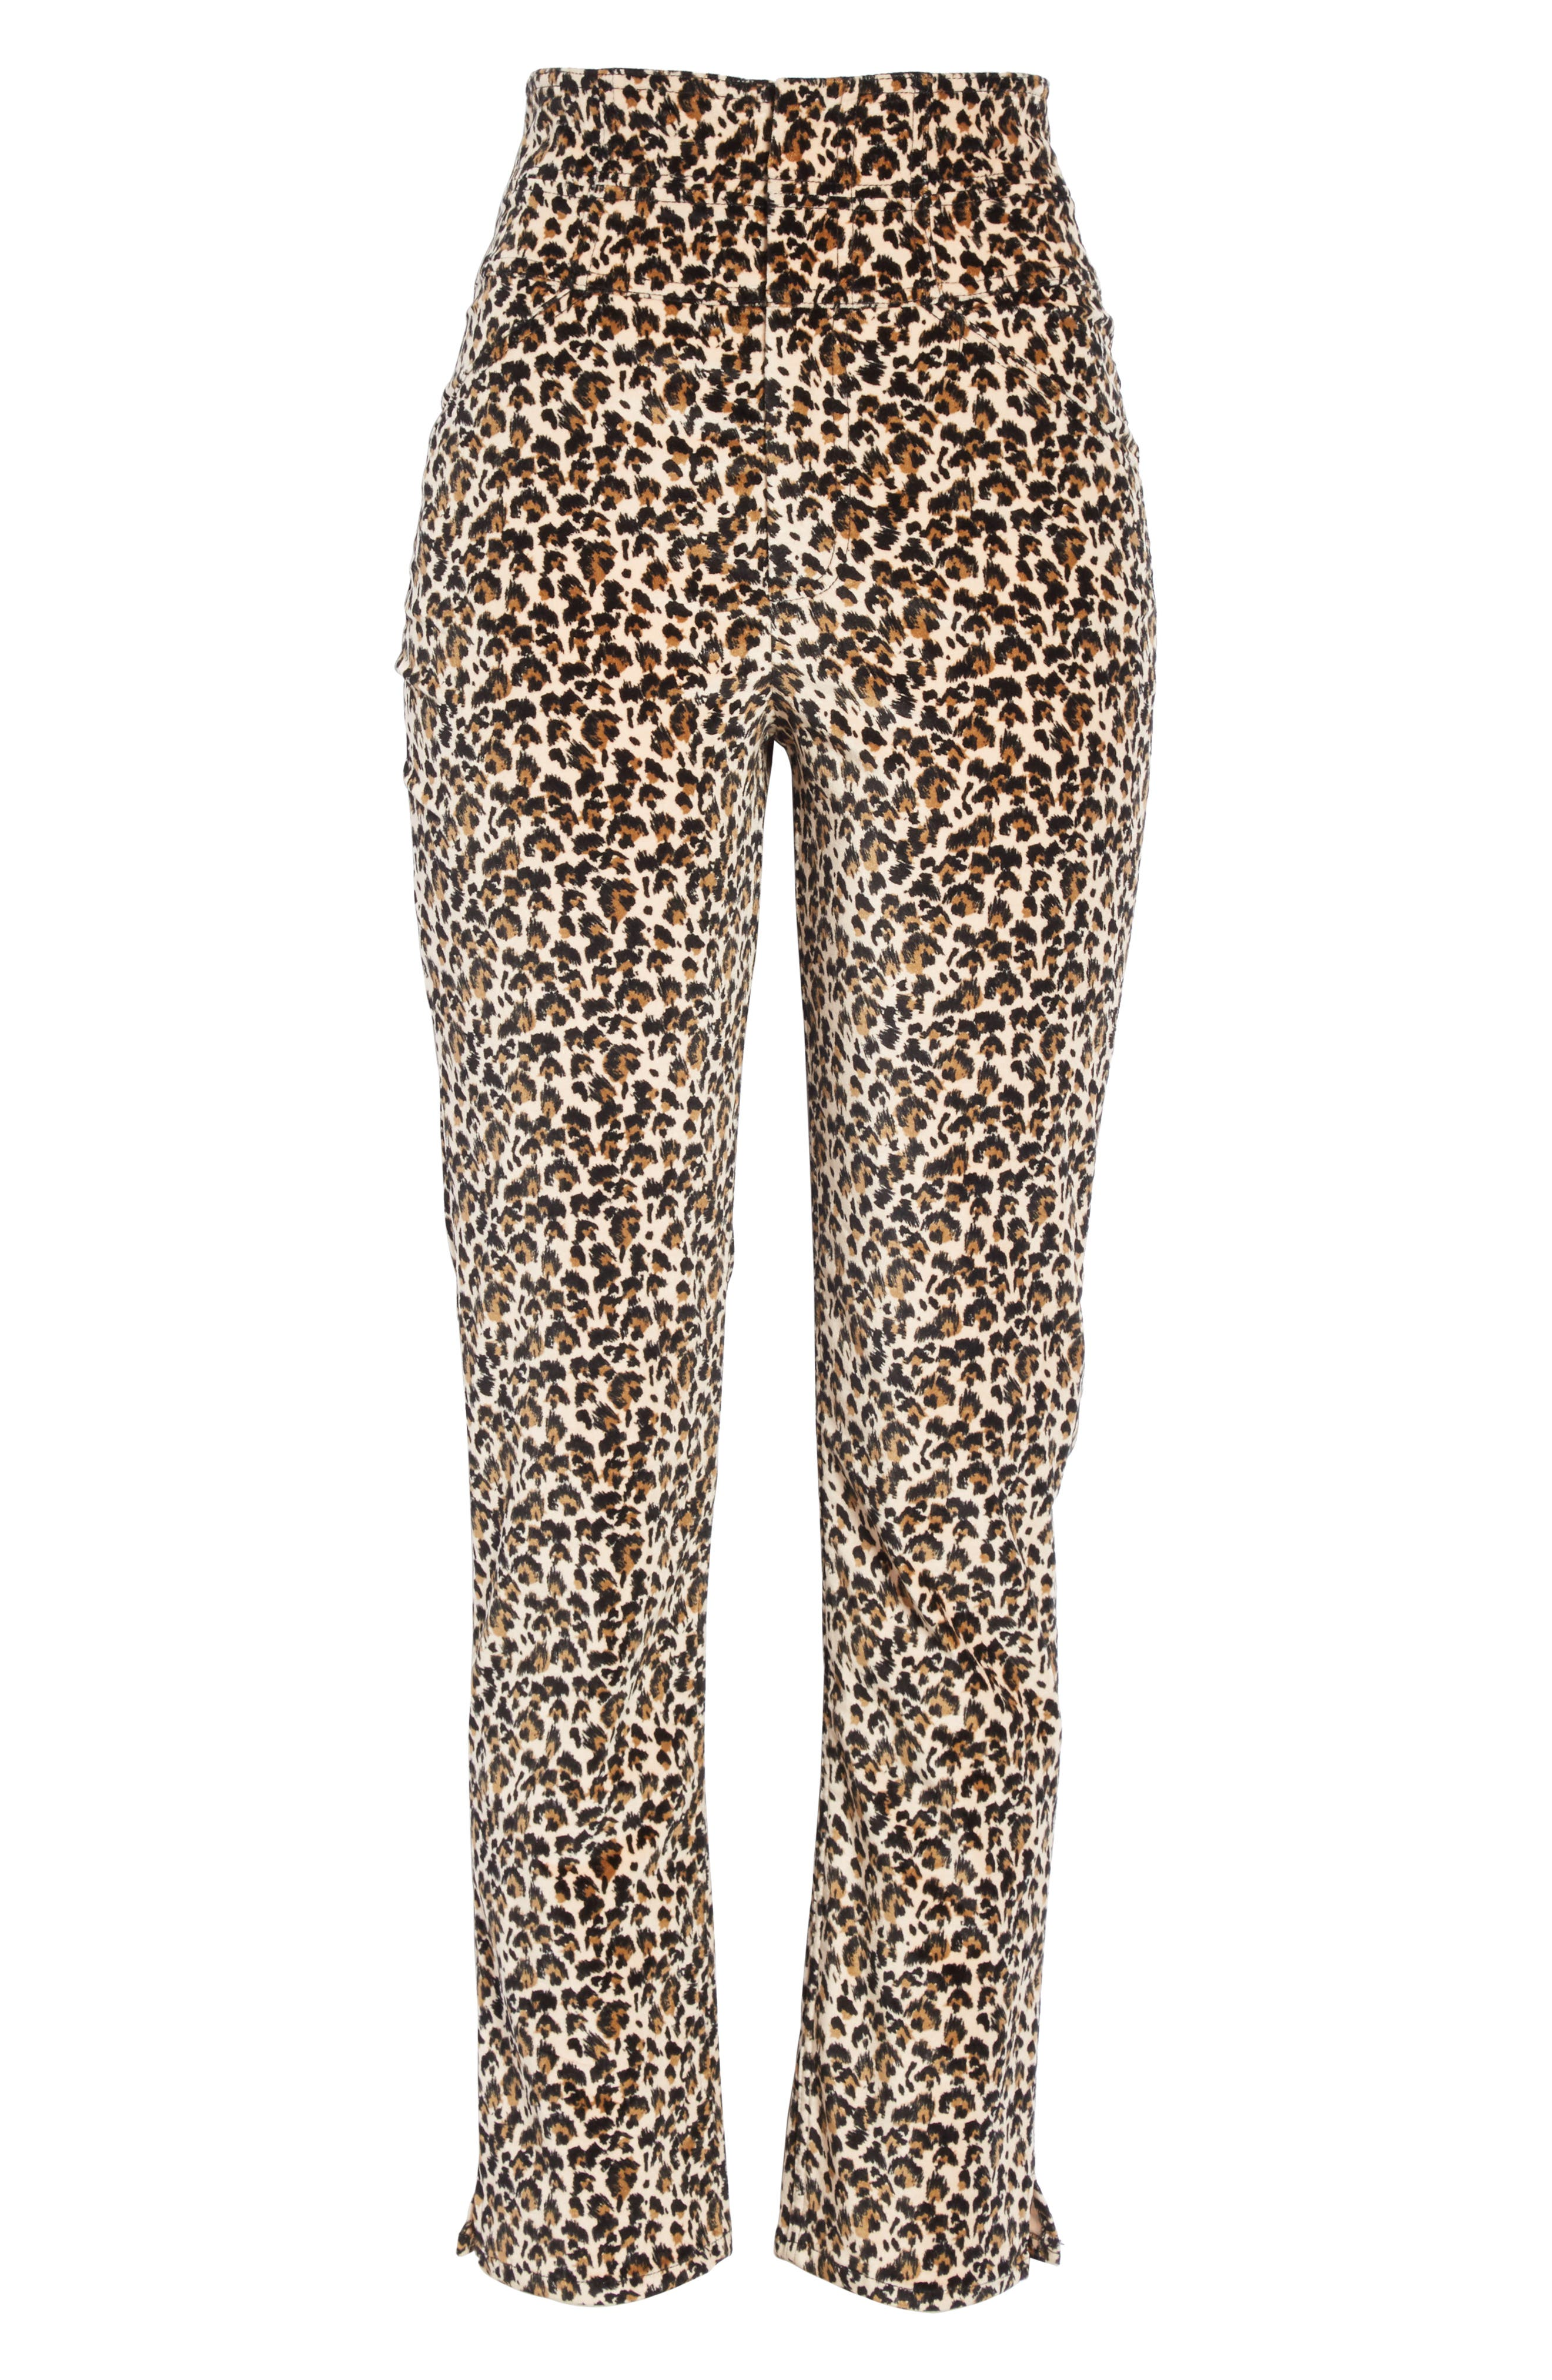 Leopard Print Stretch Velvet Pants,                             Alternate thumbnail 6, color,                             250